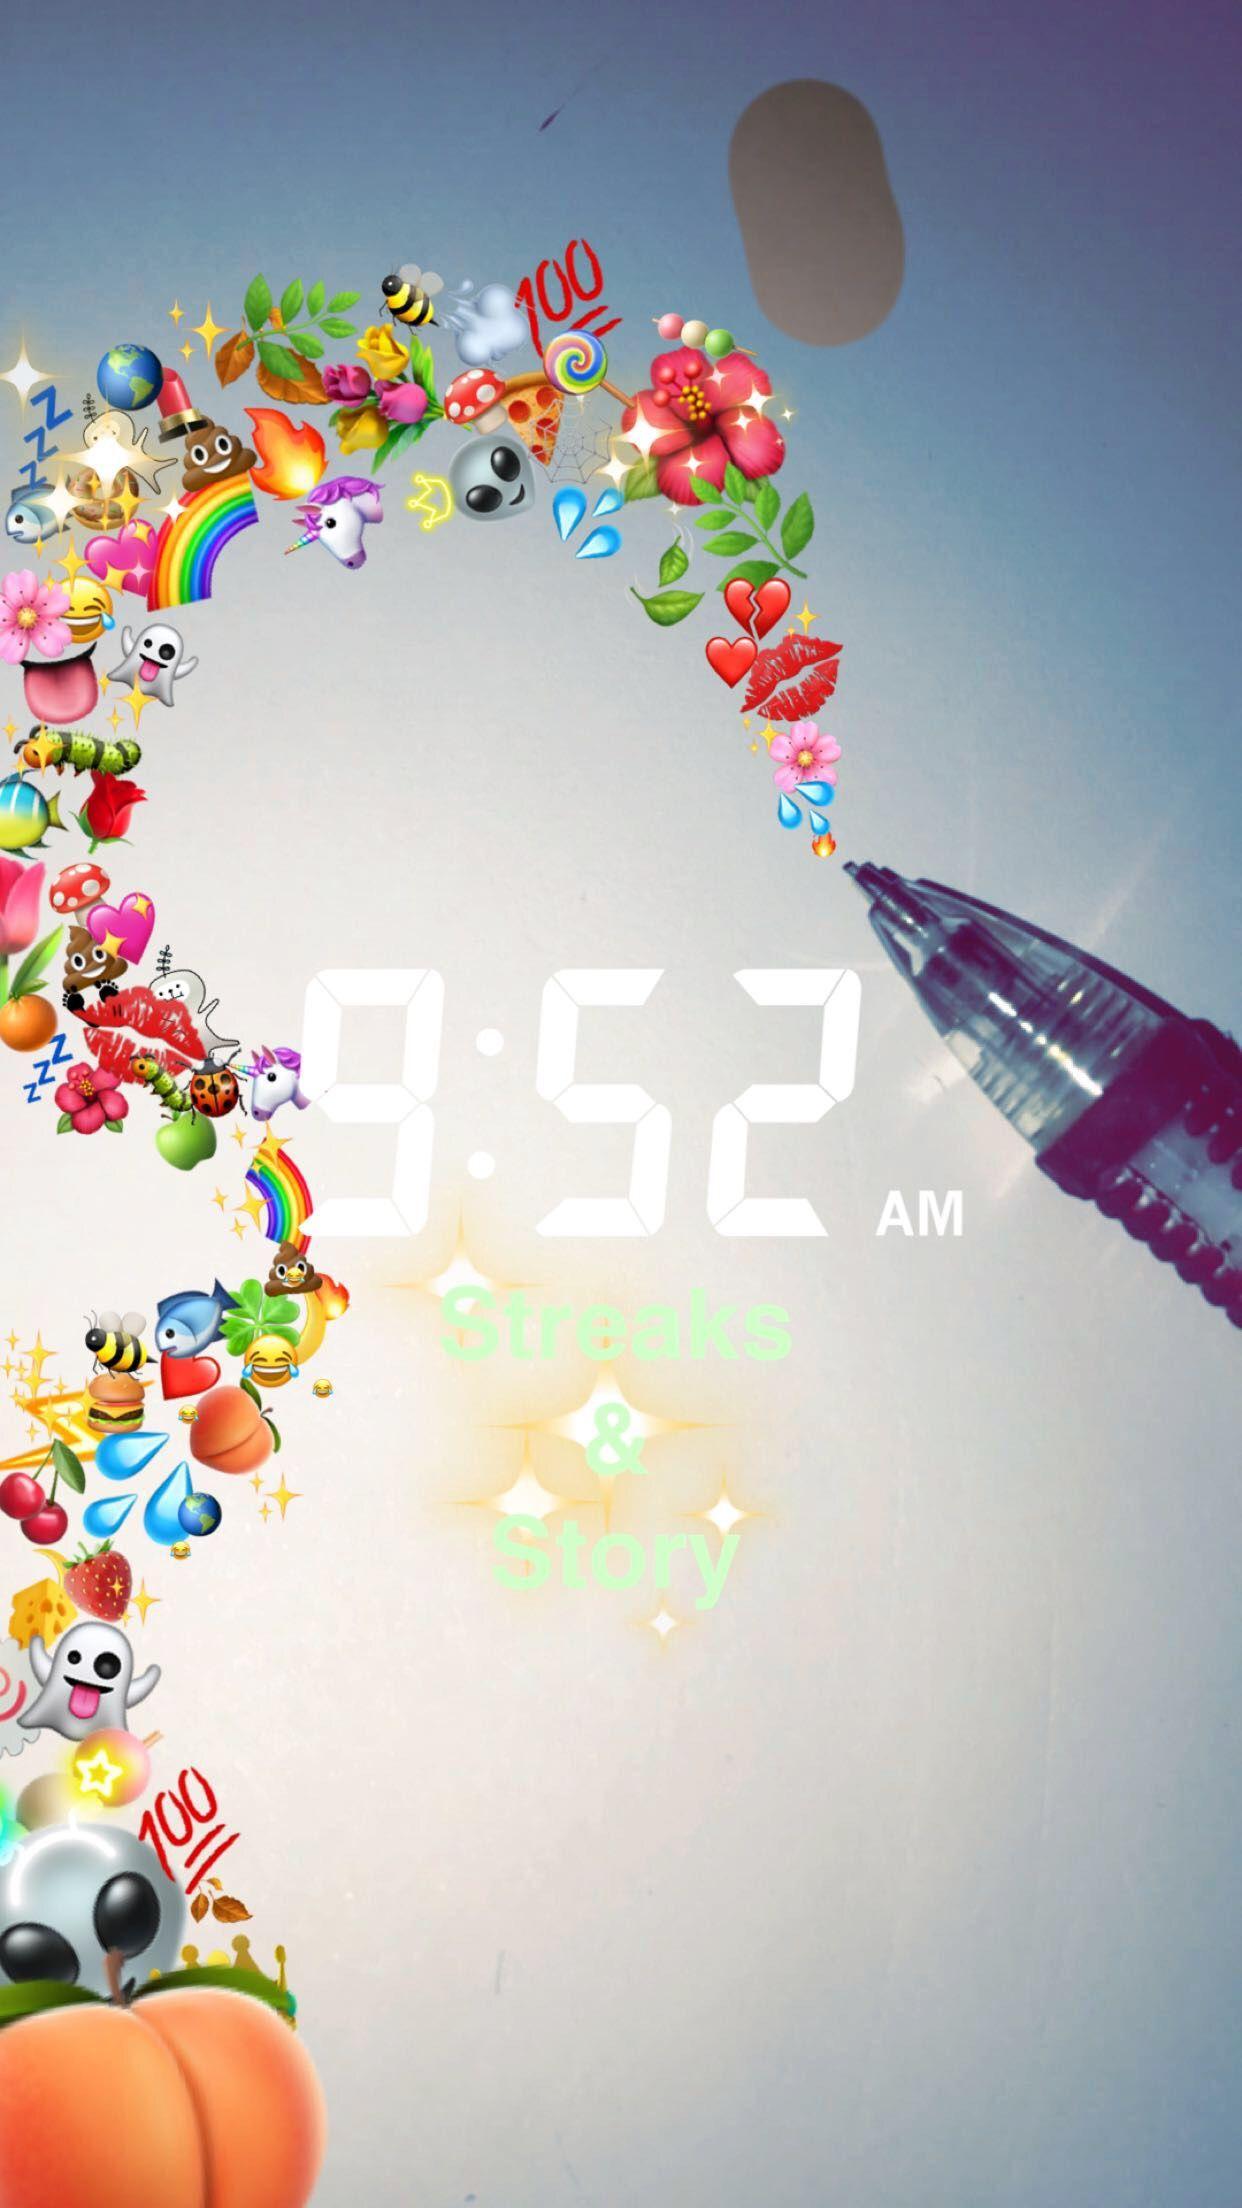 Pinkoreoo Sent To My Streaks 9 3 17 Hopefully U Get Inspired To Do Something Different Como Fazer Fotos Tumblr Ideias Criativas Ideias Instagram